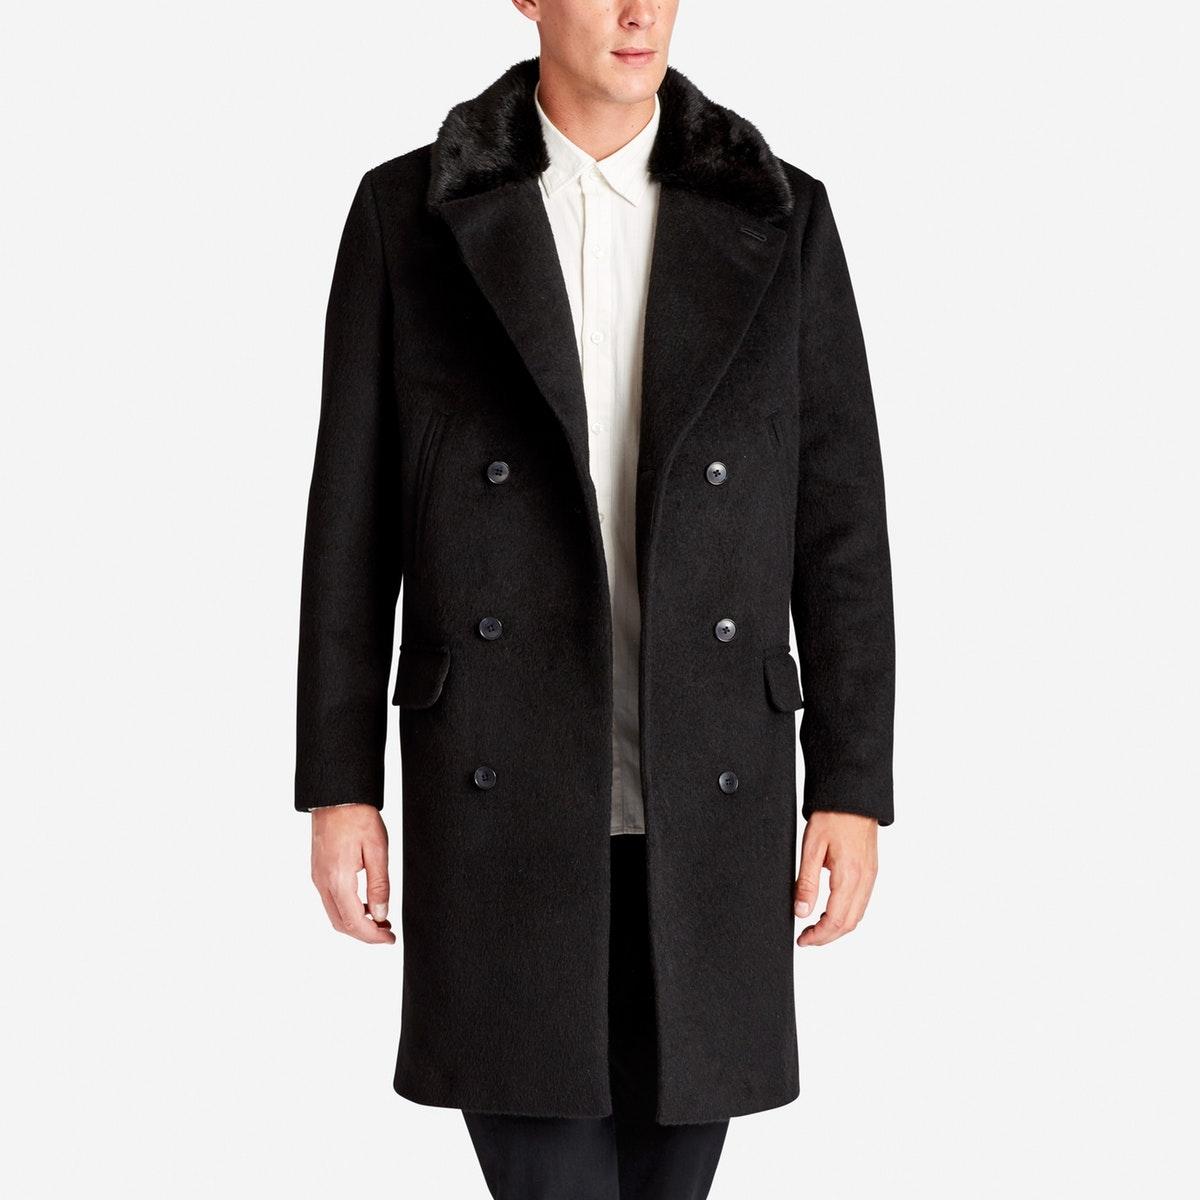 The Shearling Top Coat